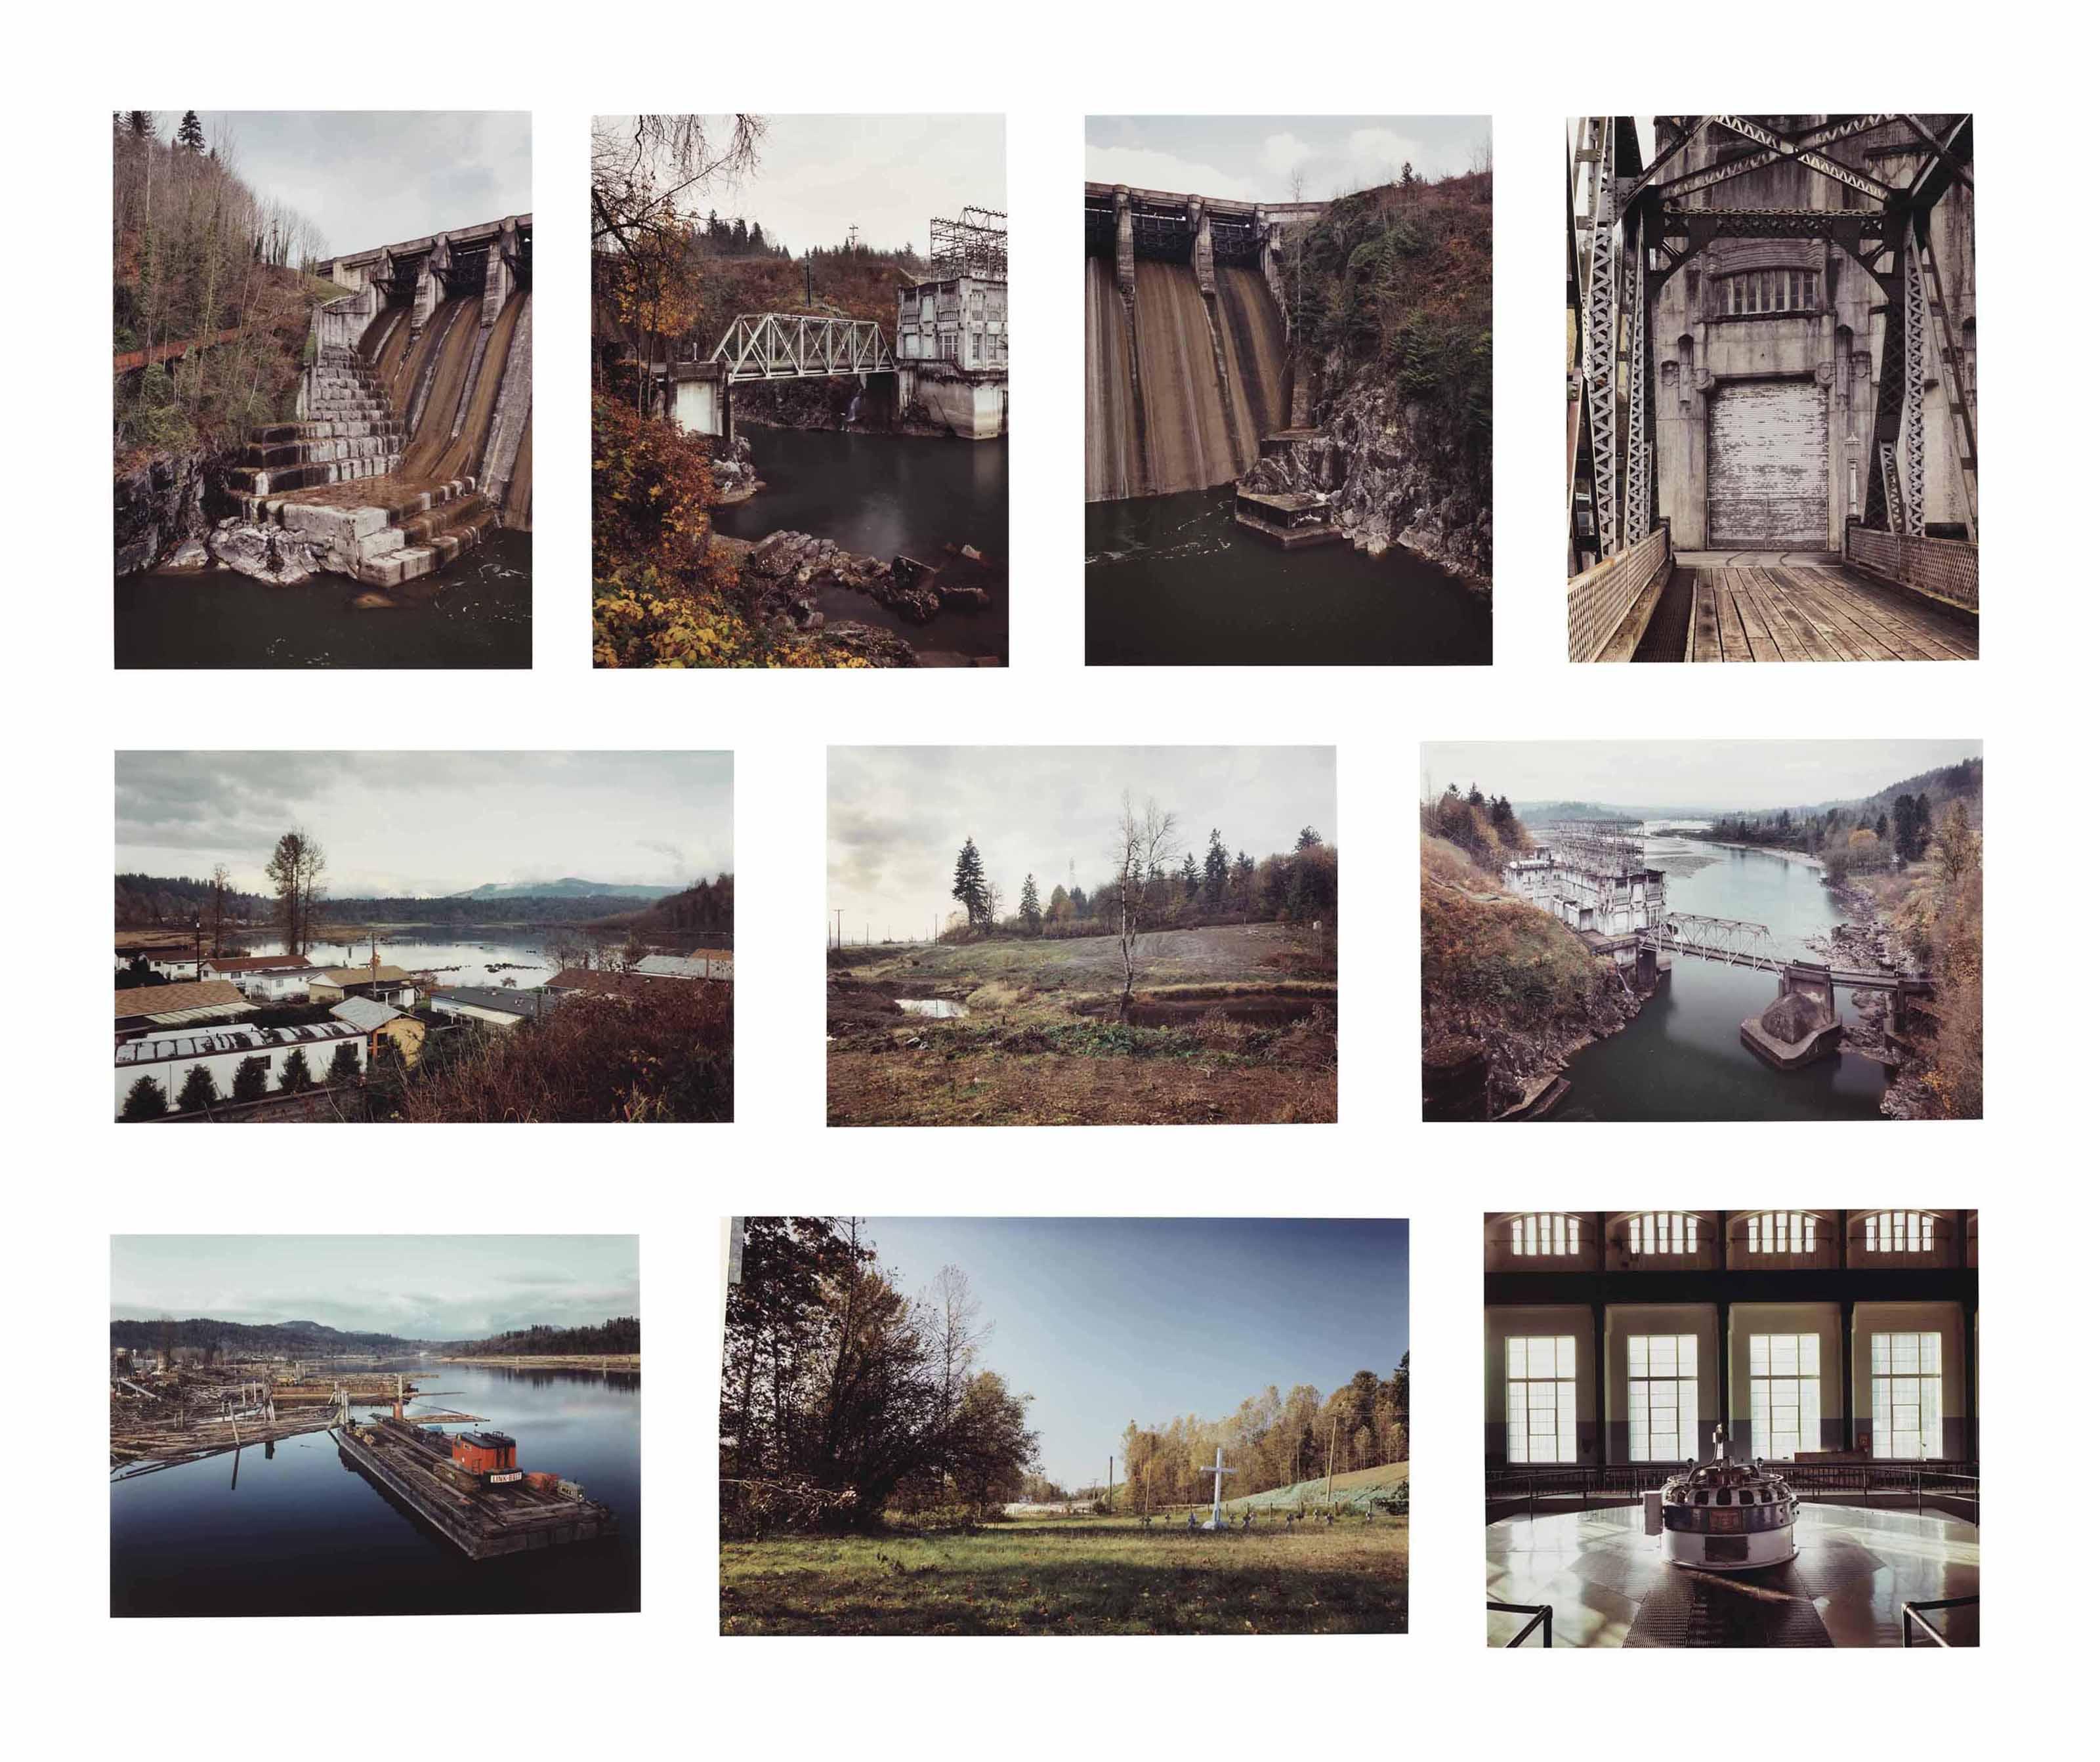 Pursuit, Fear, Catastrophe: Ruskin, B.C., 1993